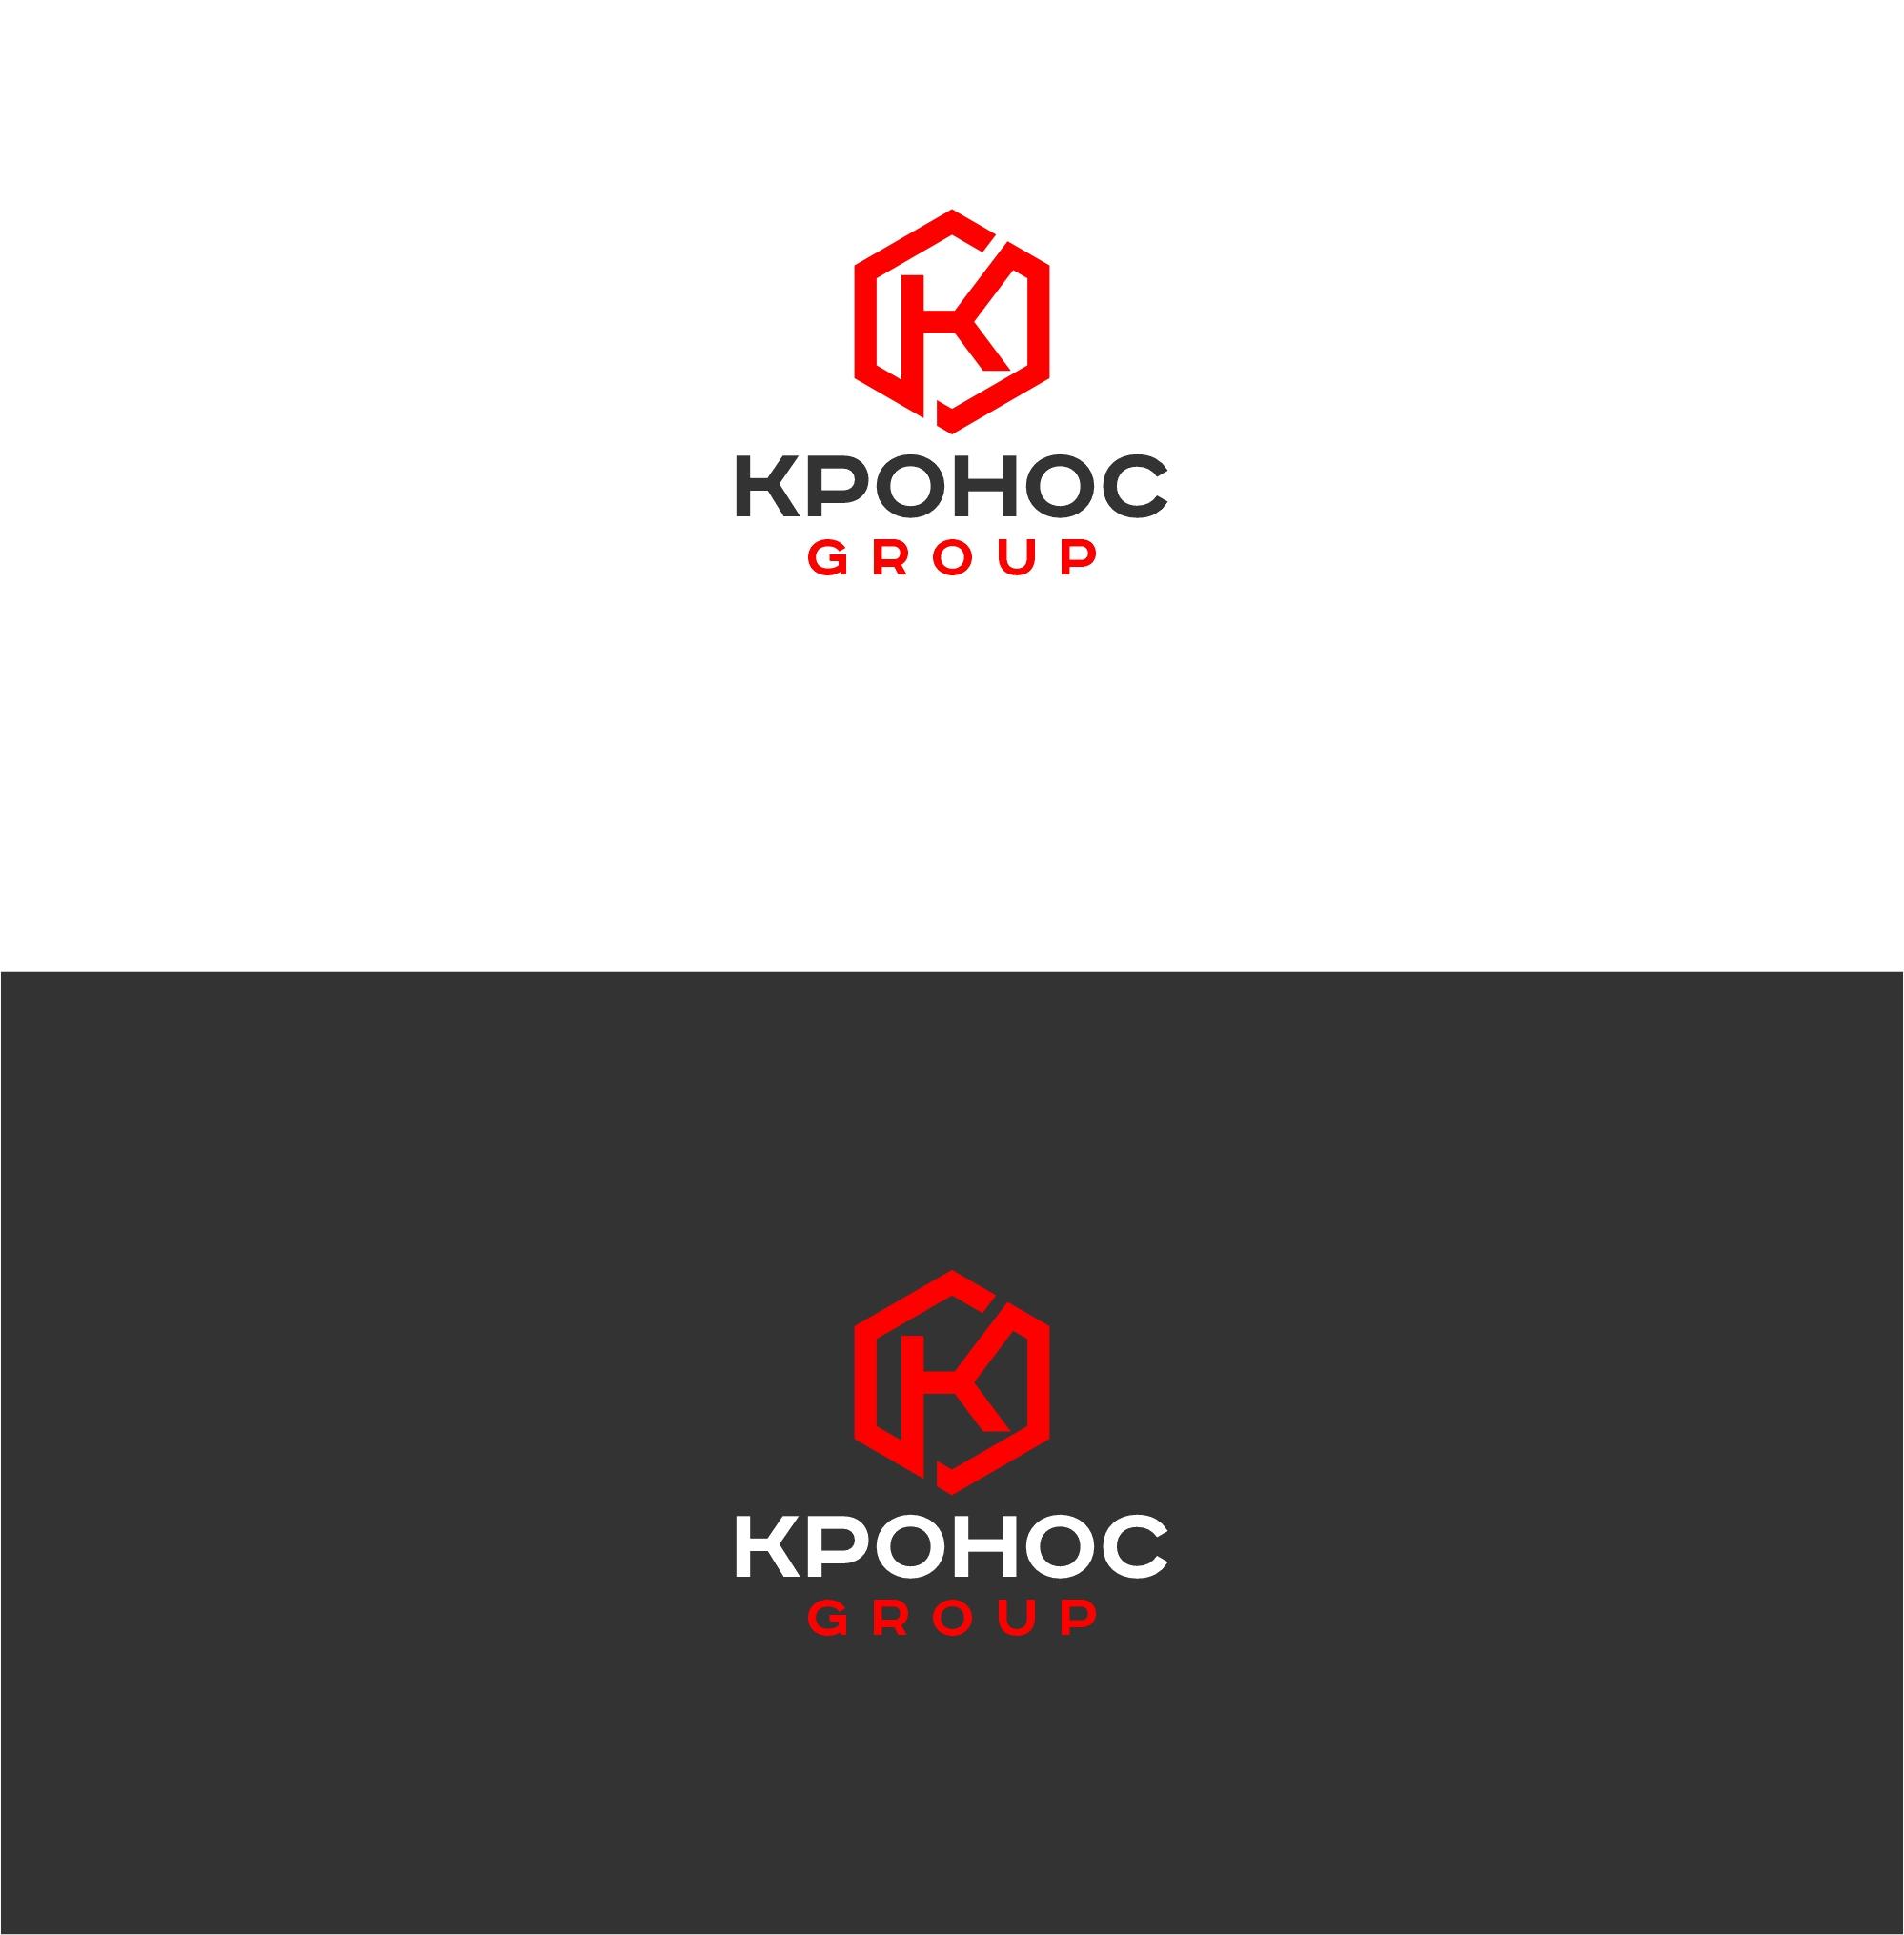 Разработать логотип KRONOS фото f_2595fb575855380c.jpg